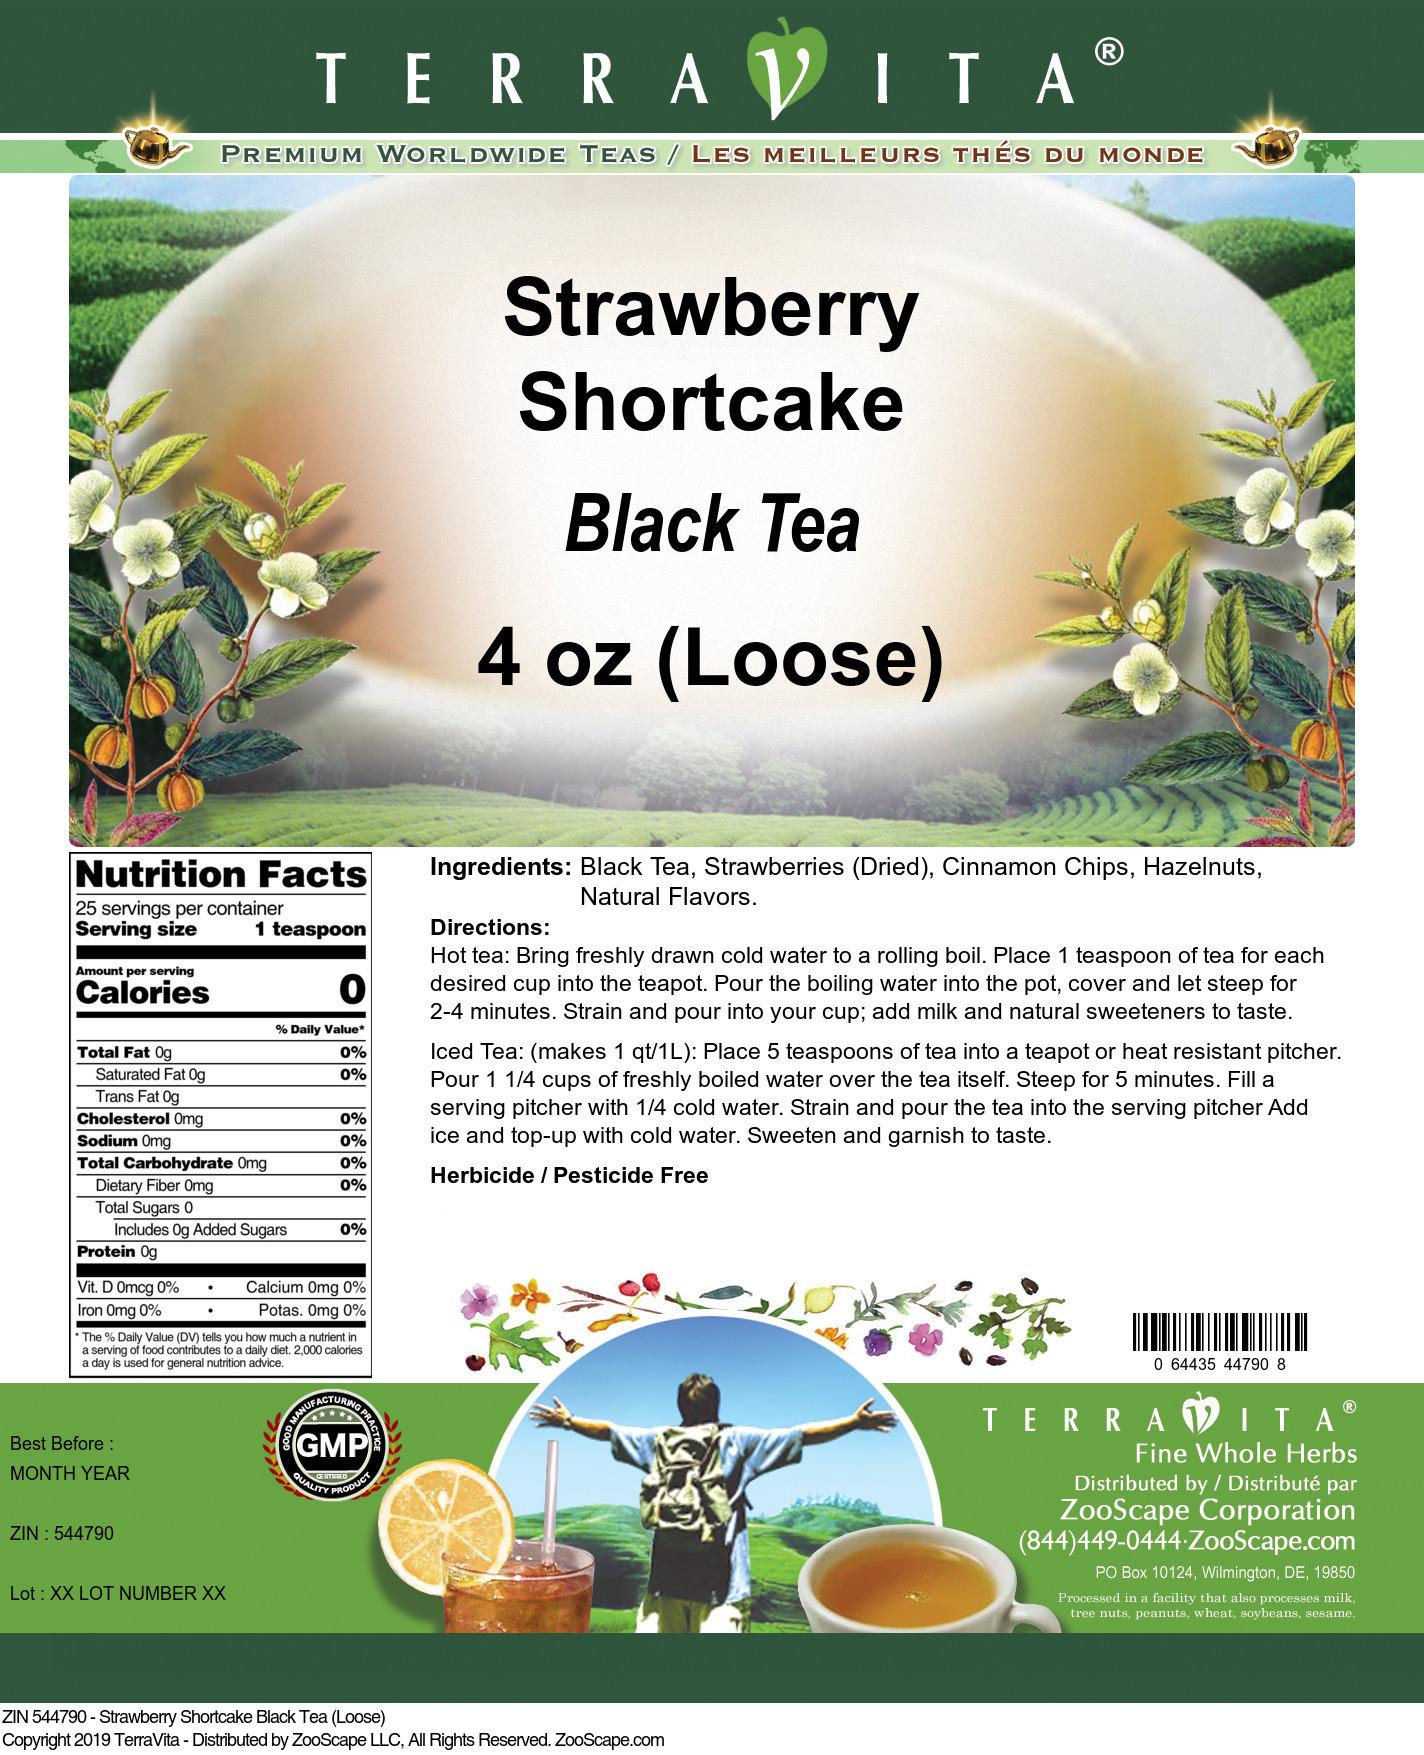 Strawberry Shortcake Black Tea